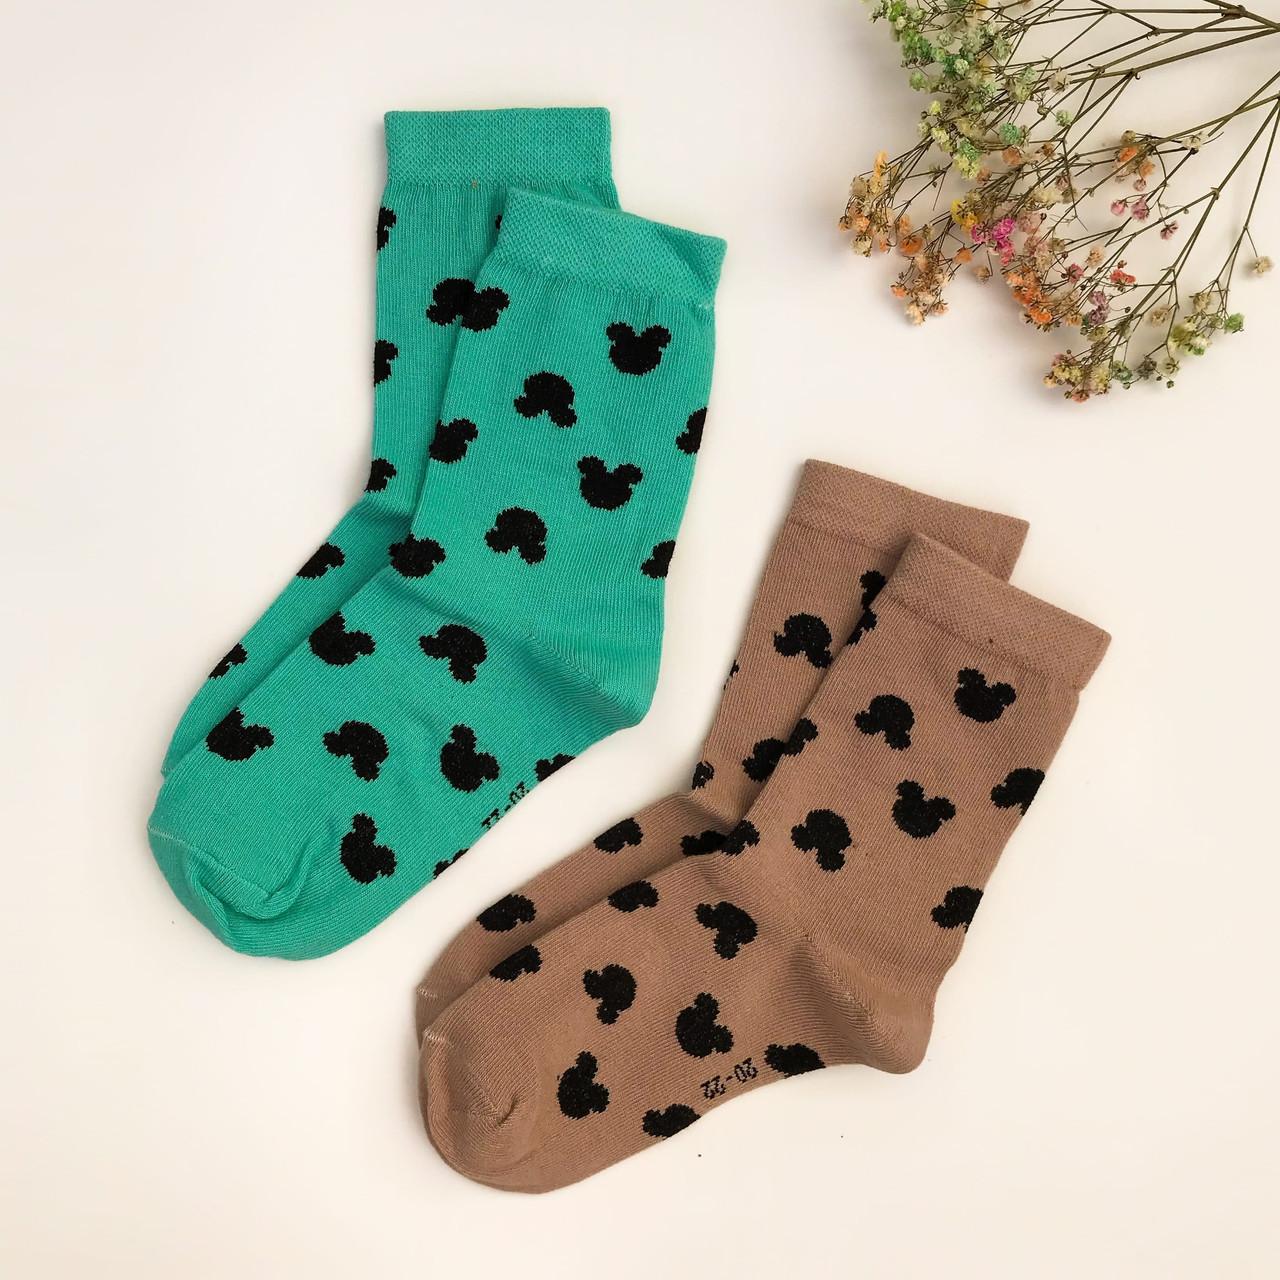 Носки для девочек V&T socks с рисунком Микки 20-22 (7-9 лет), Бежевый